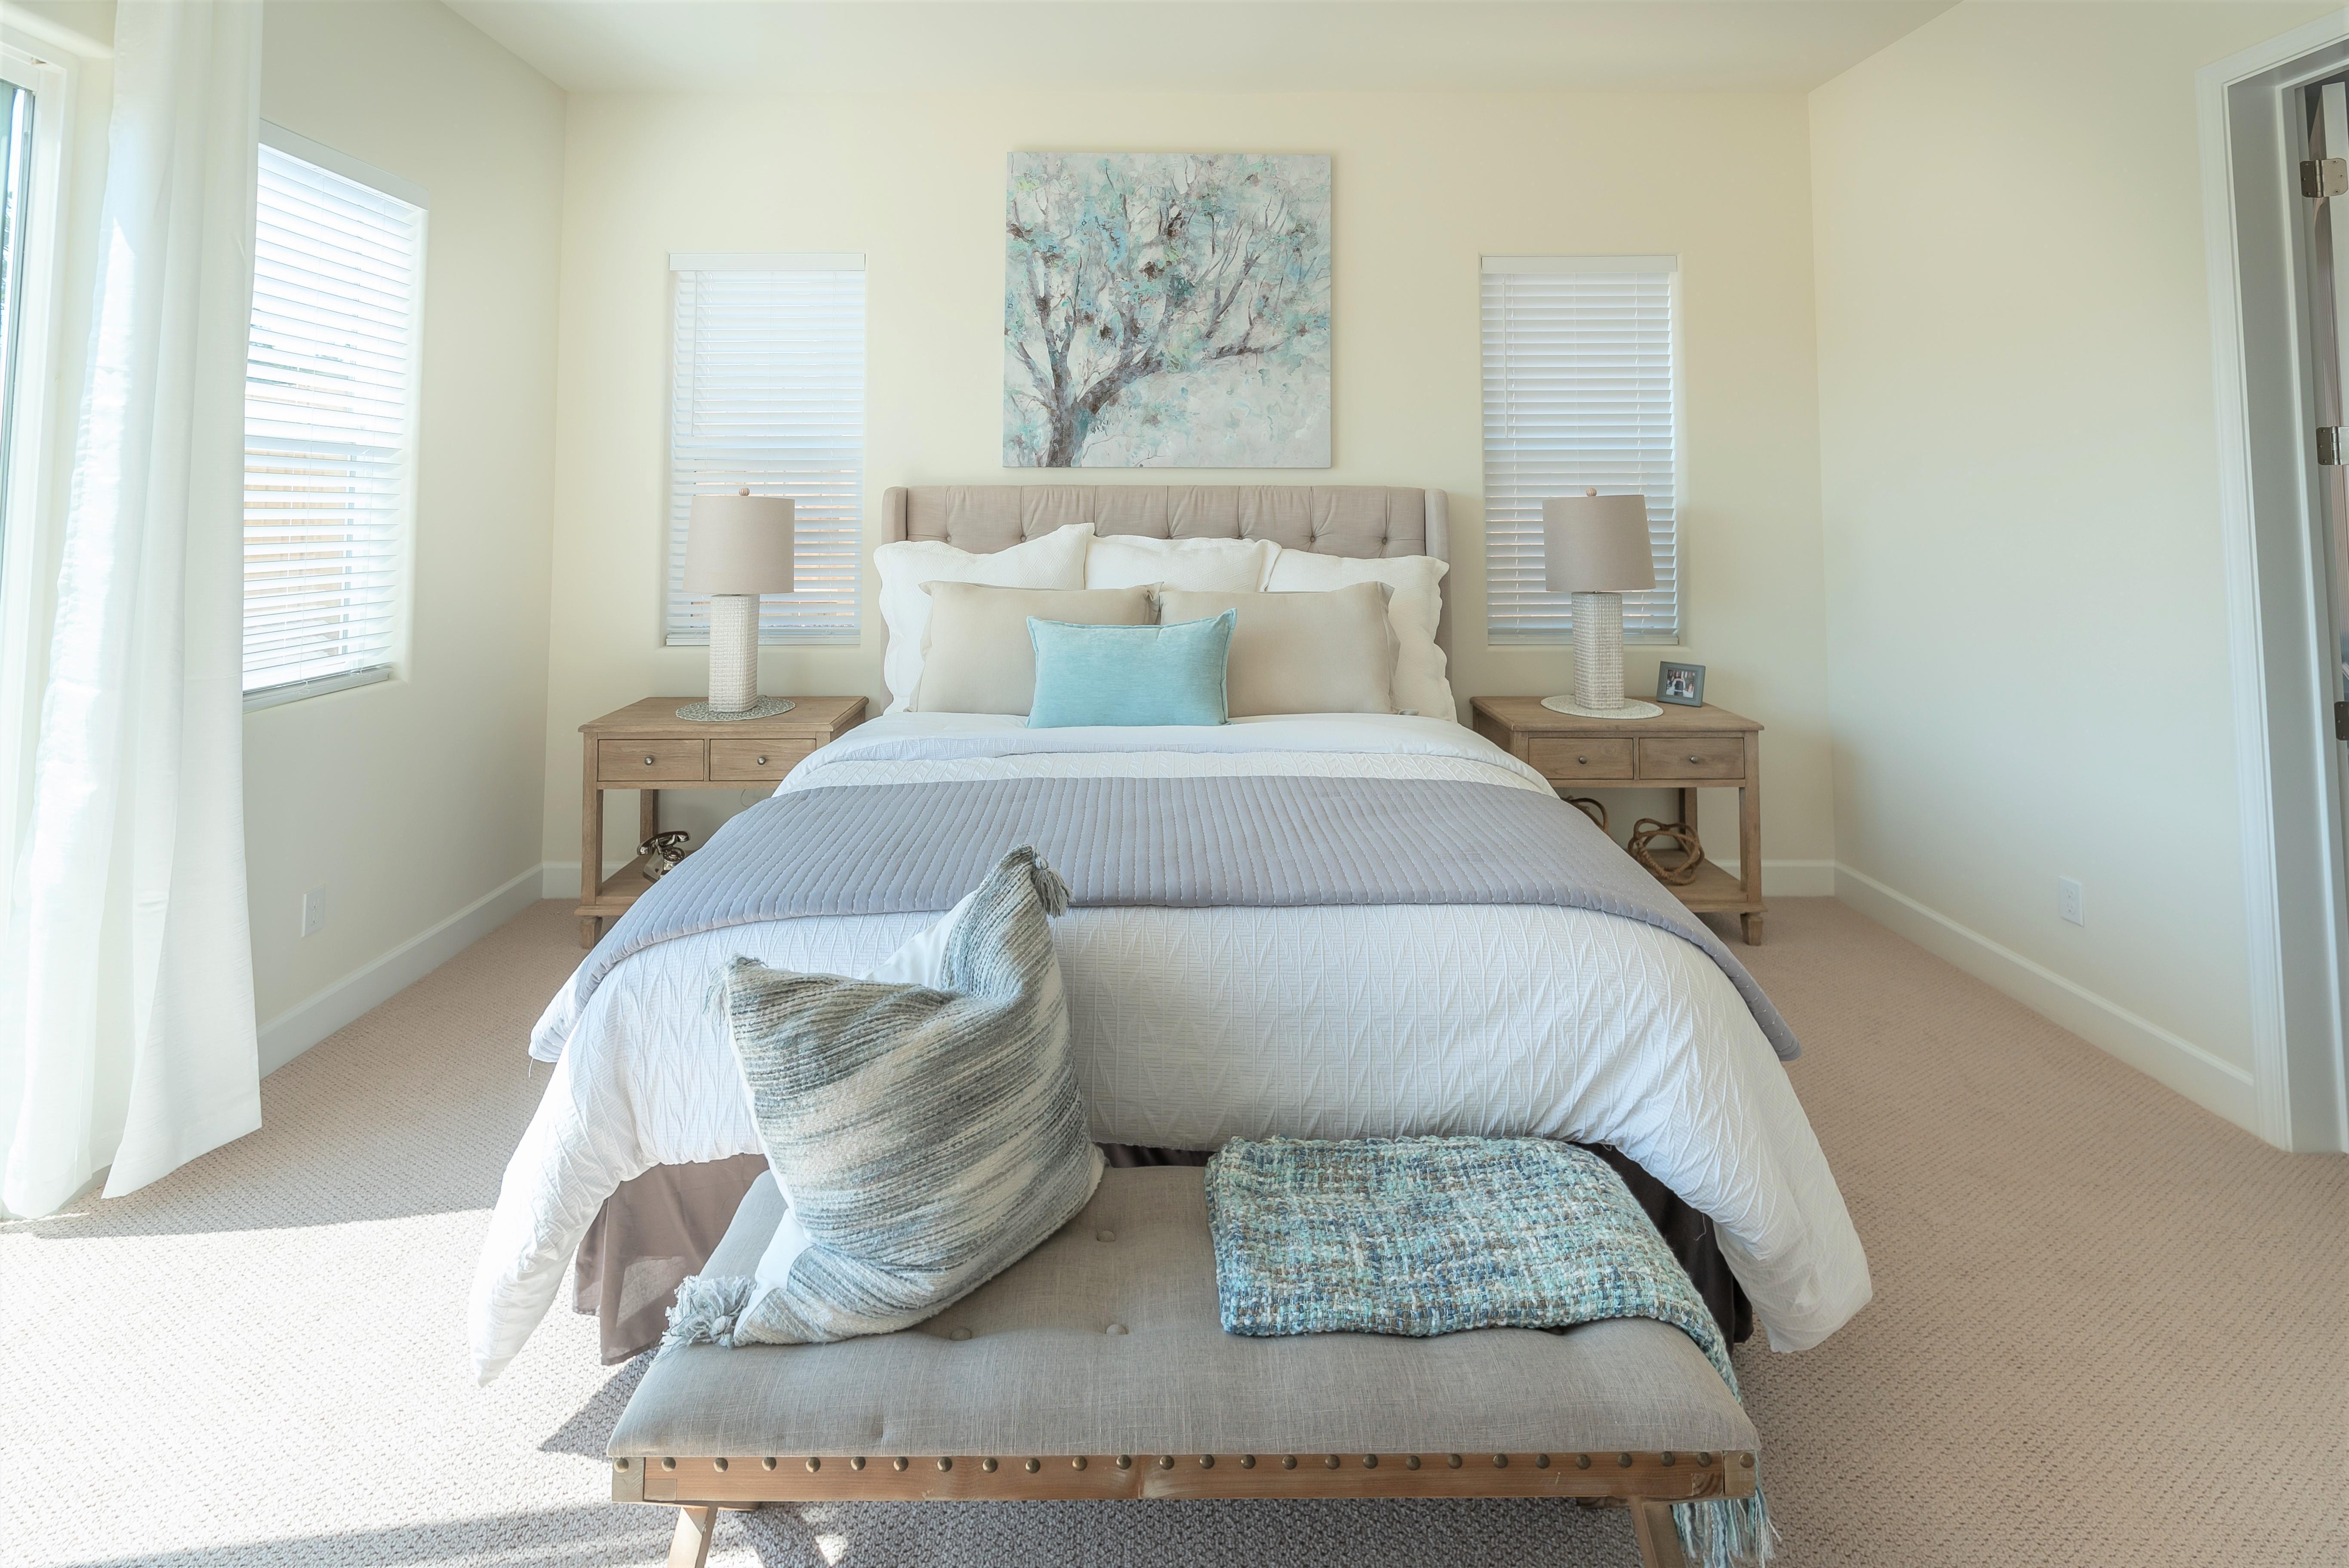 Bedroom featured in the Cambridge By Coastal Community Builders in Santa Barbara, CA